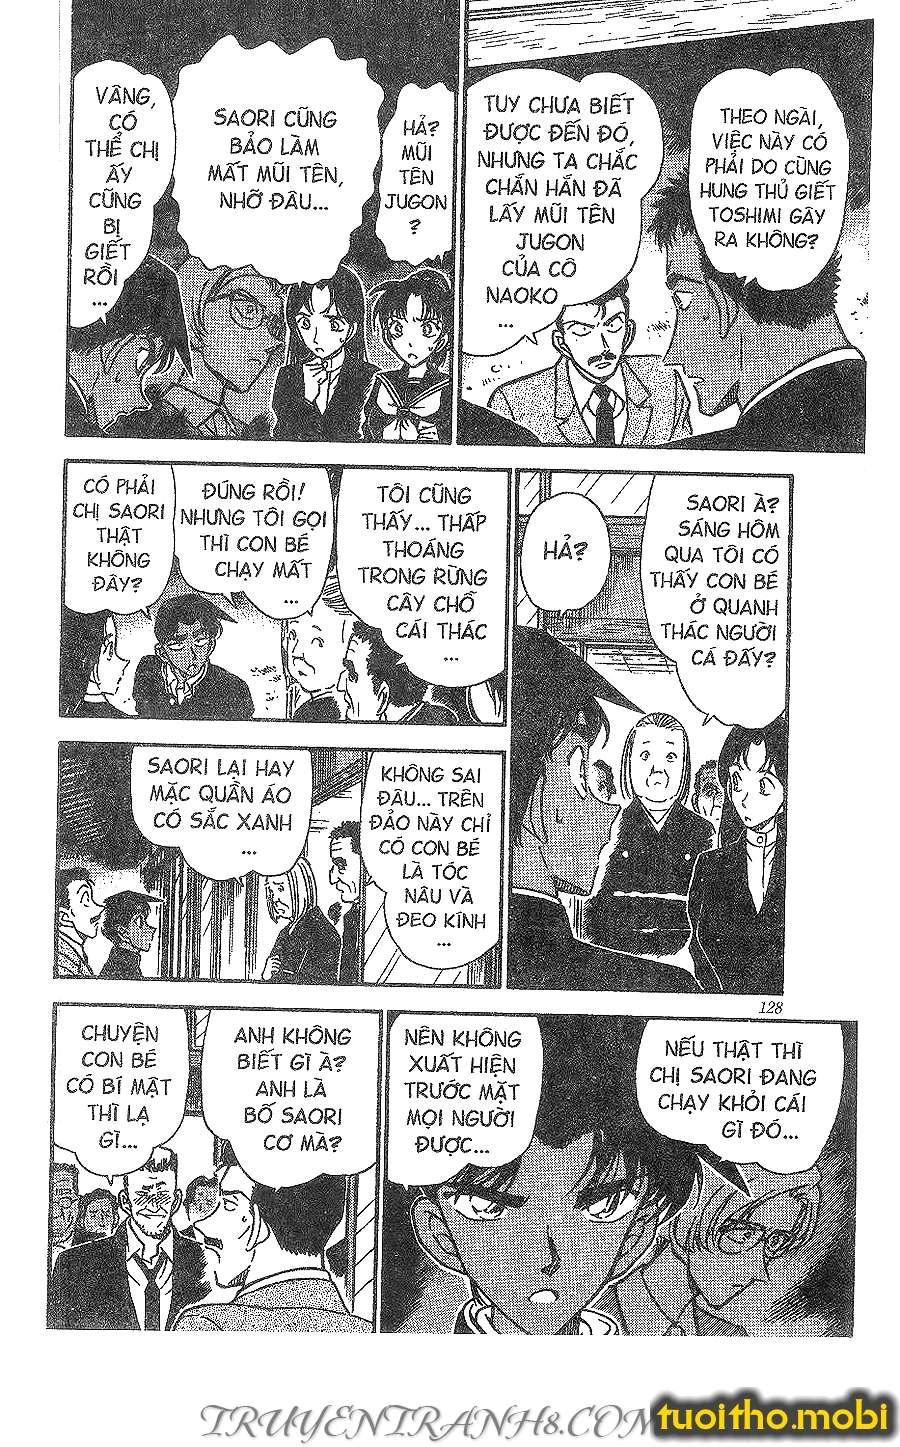 conan chương 281 trang 5